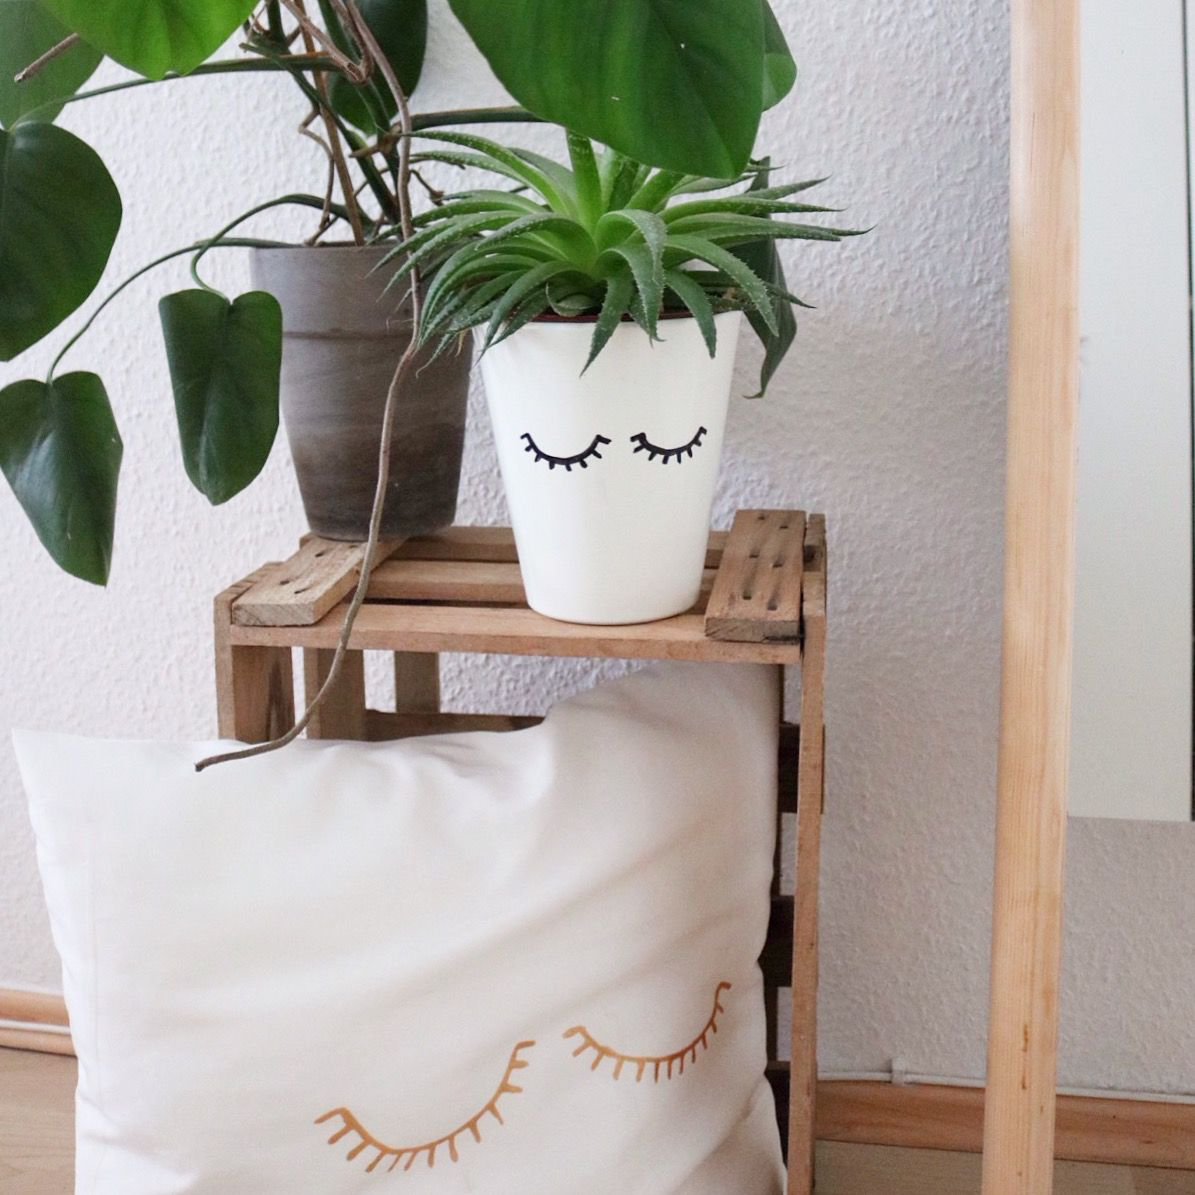 diy kissen diy bertopf bemalen mr planter miss pillow diy 39 s doitbutdoitnow. Black Bedroom Furniture Sets. Home Design Ideas